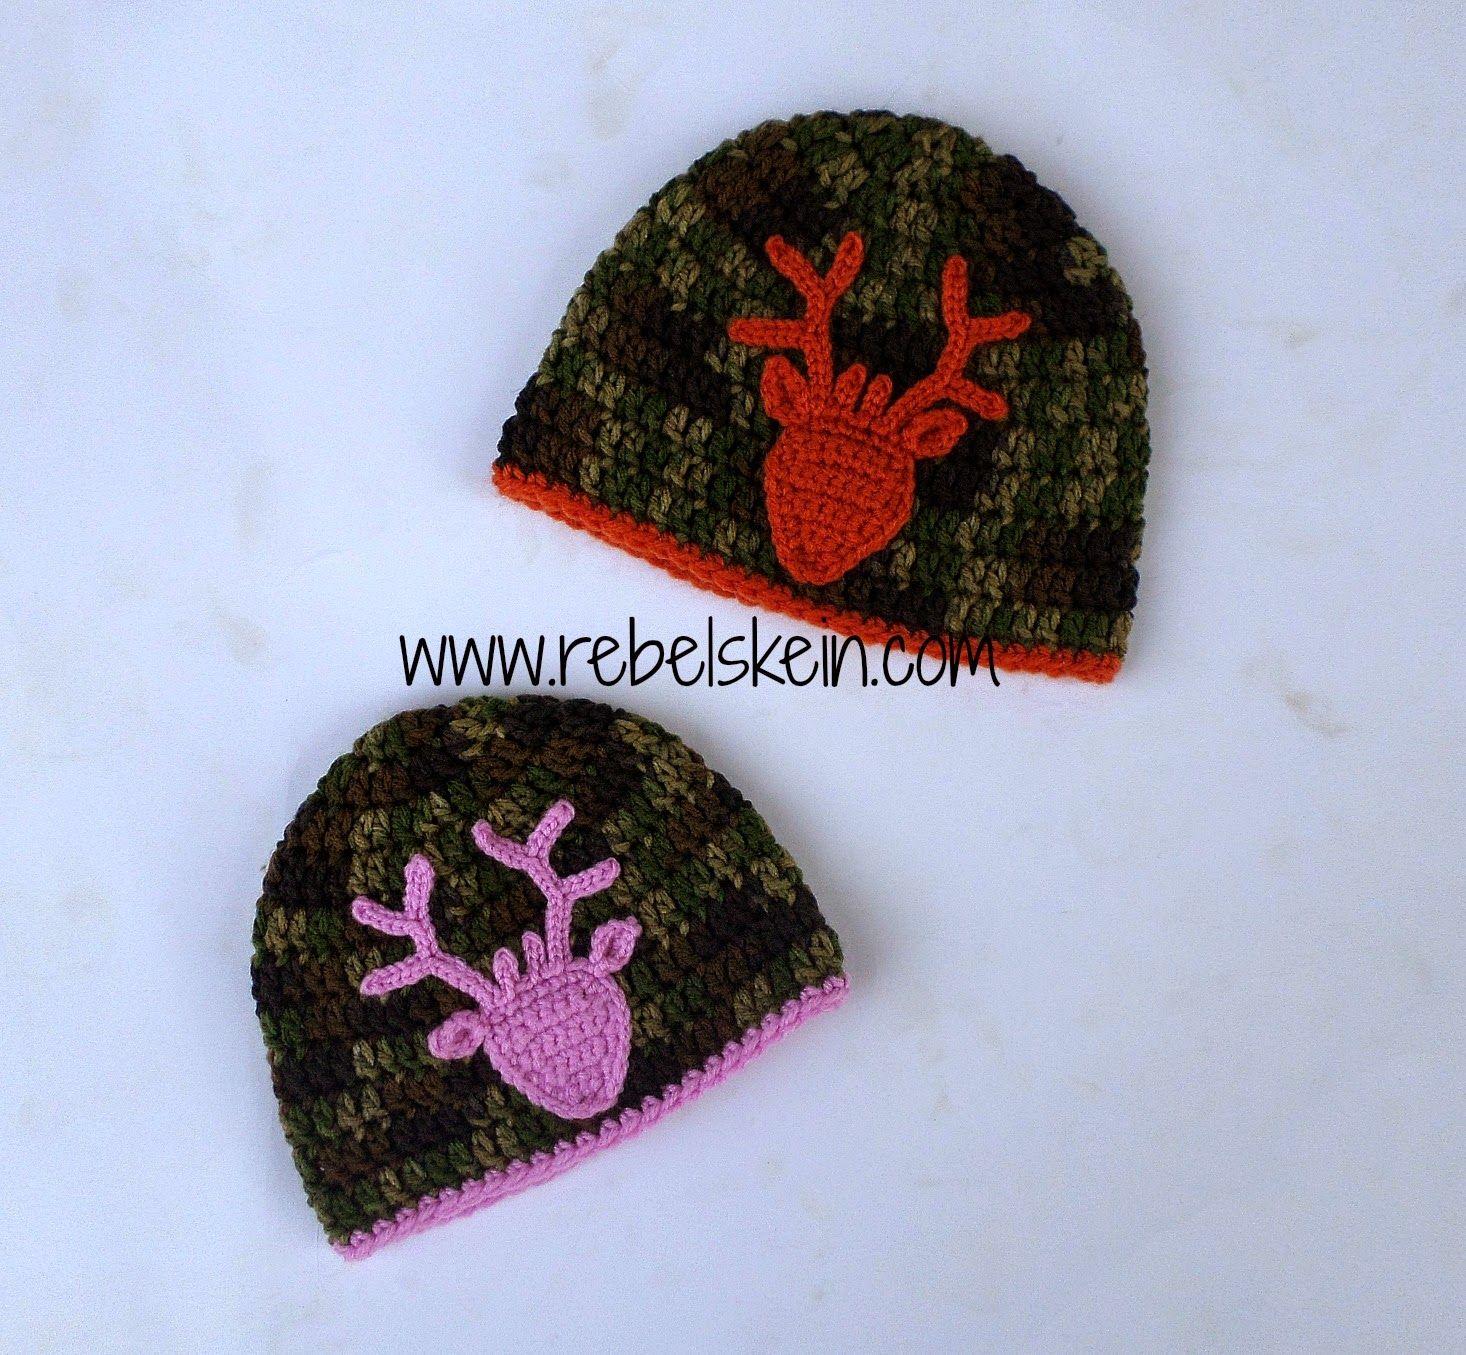 Pin By Baylea Martin On Crafts Pinterest Crochet Crochet